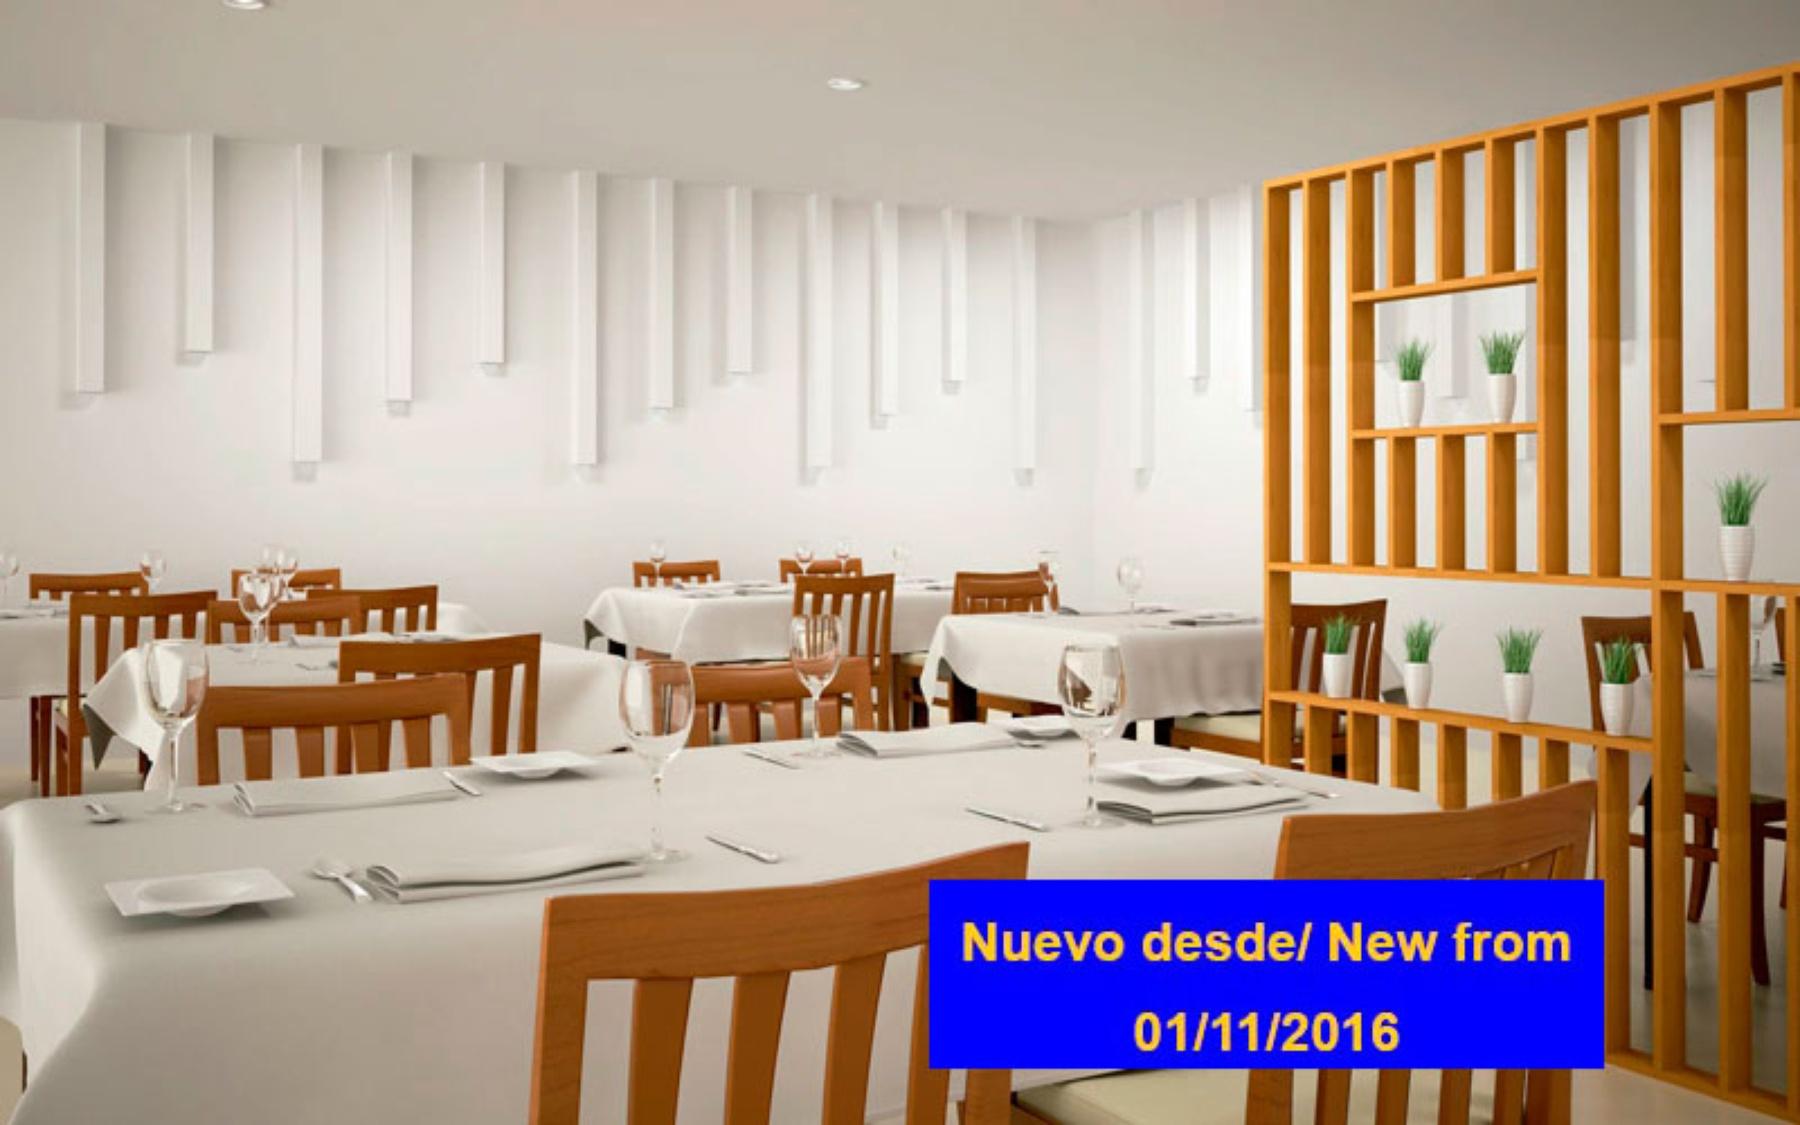 Restaurante Gaudi | Suite Hotel Atlantis Fuerteventura Resort - Corralejo - Fuerteventura - Islas Ca